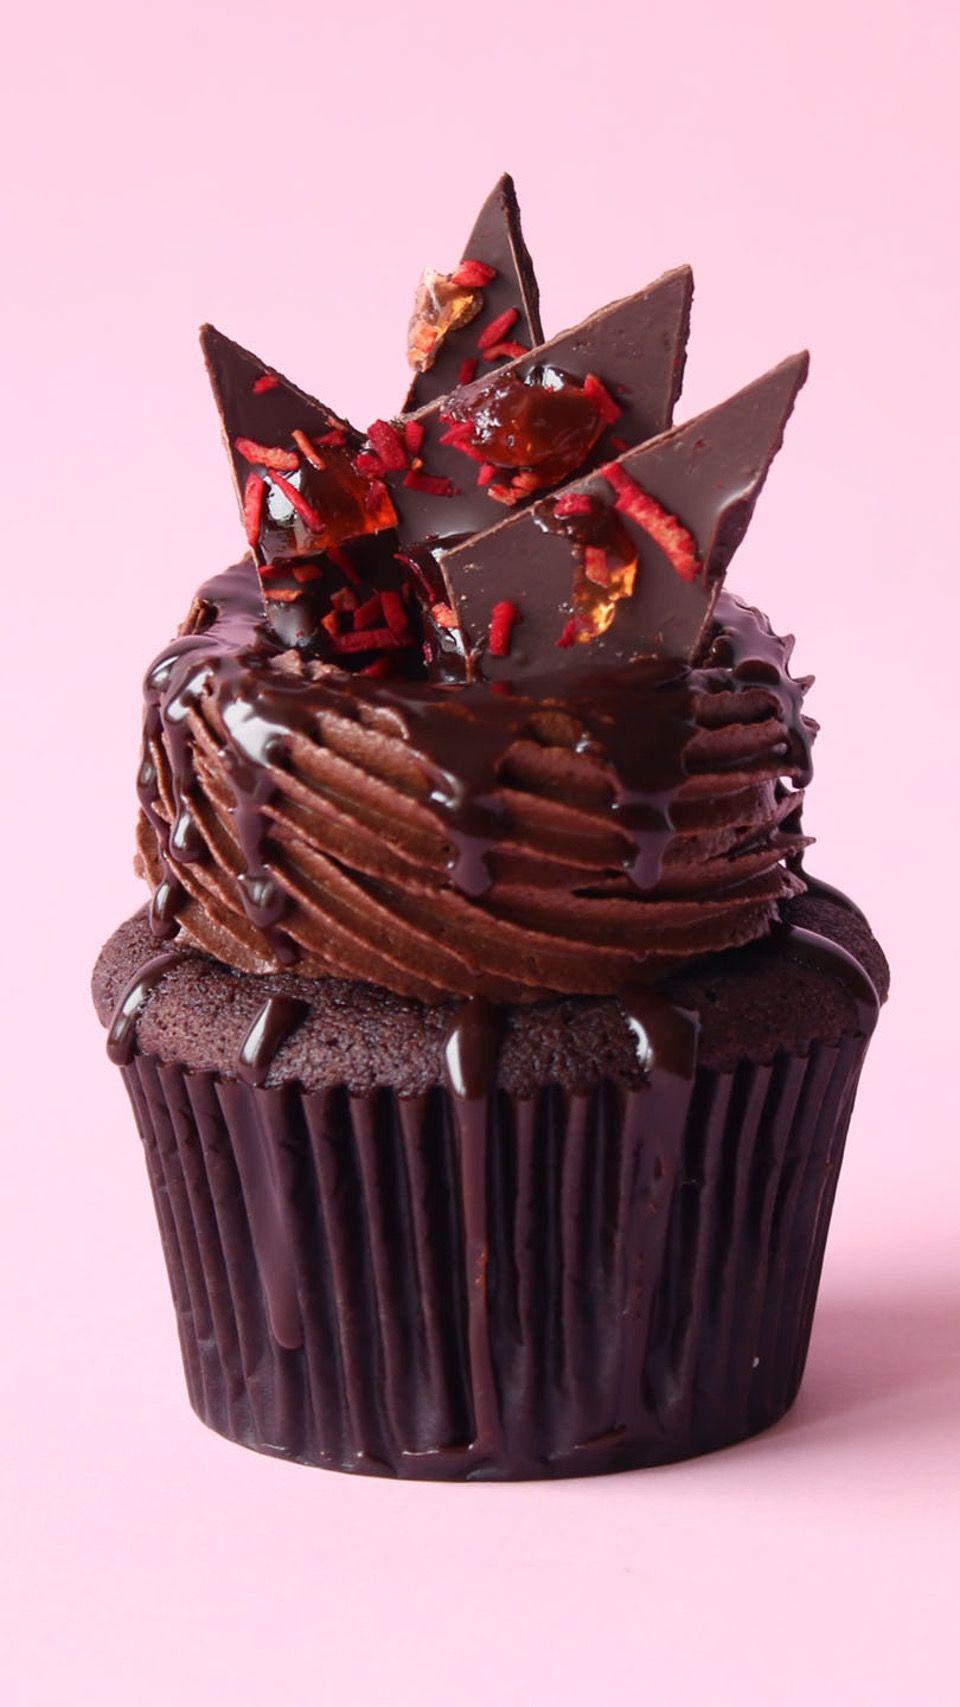 Cherry Coconut Cupcakes Recipe Cherry Coconut Chocolate Cupcakes Decoration Best Chocolate Cupcakes